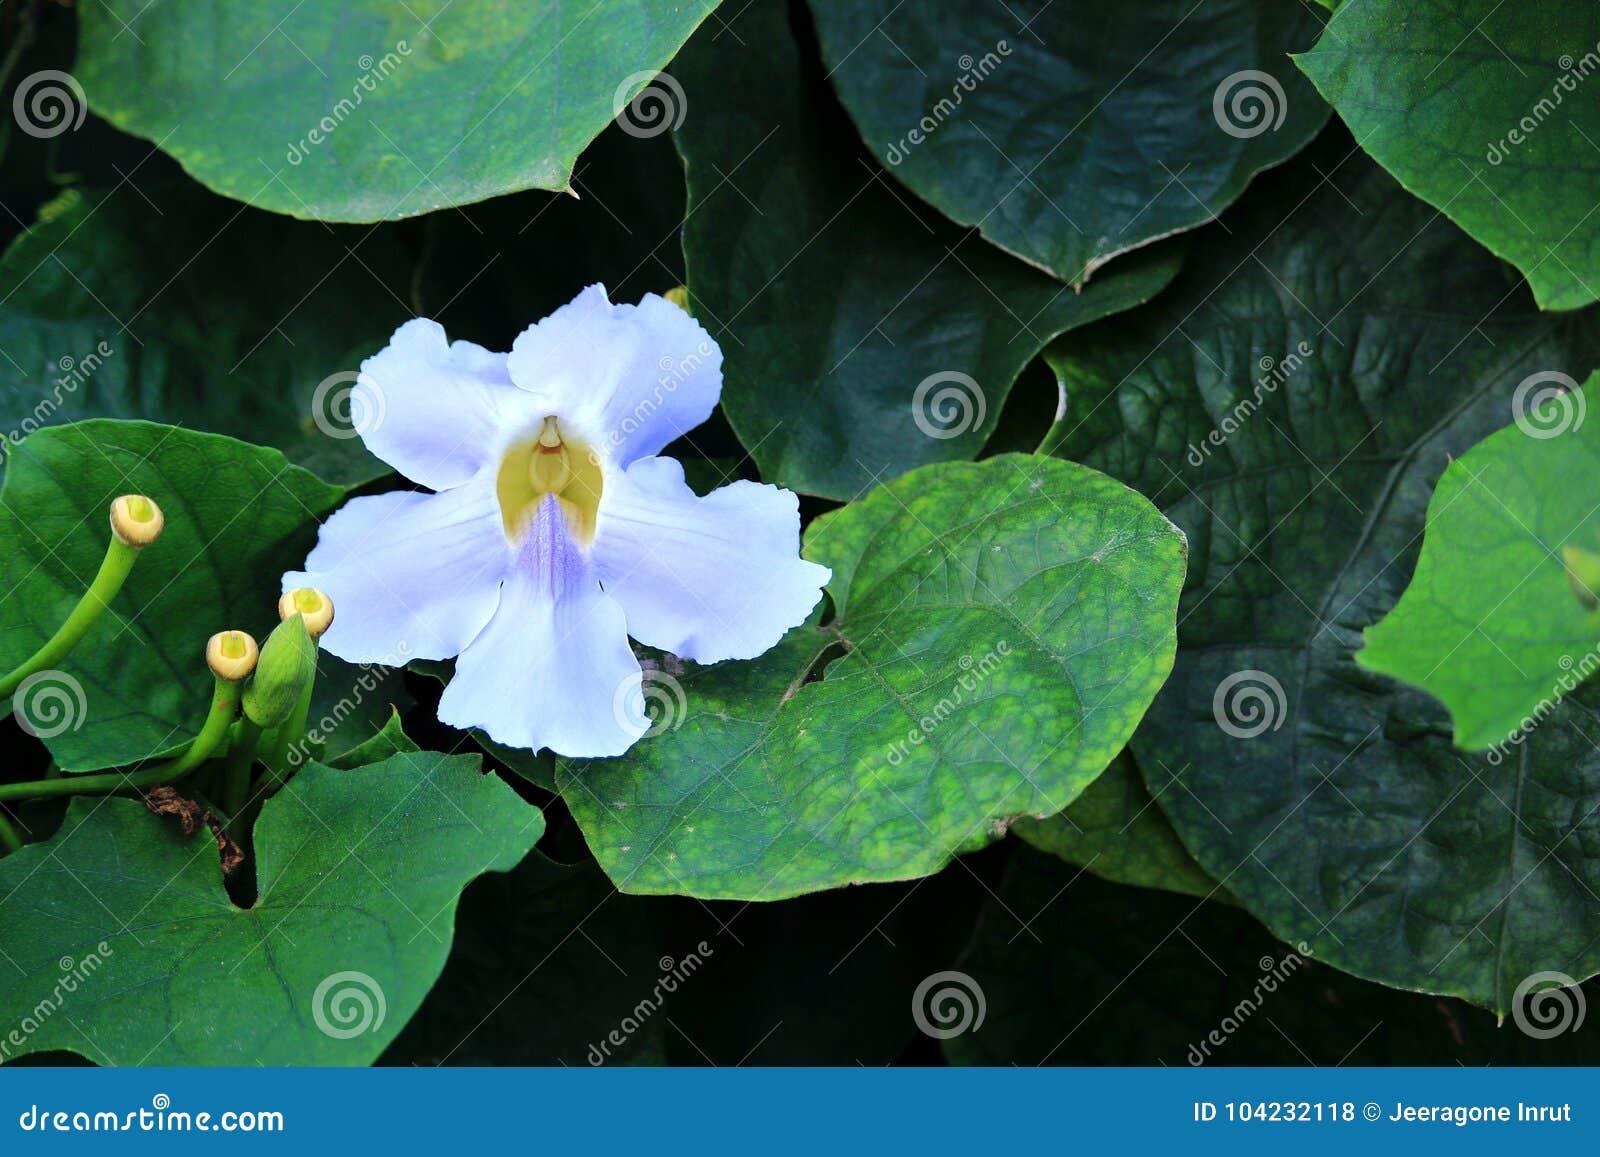 Blue trumpet vine flower stock photo image of flower 104232118 download blue trumpet vine flower stock photo image of flower 104232118 izmirmasajfo